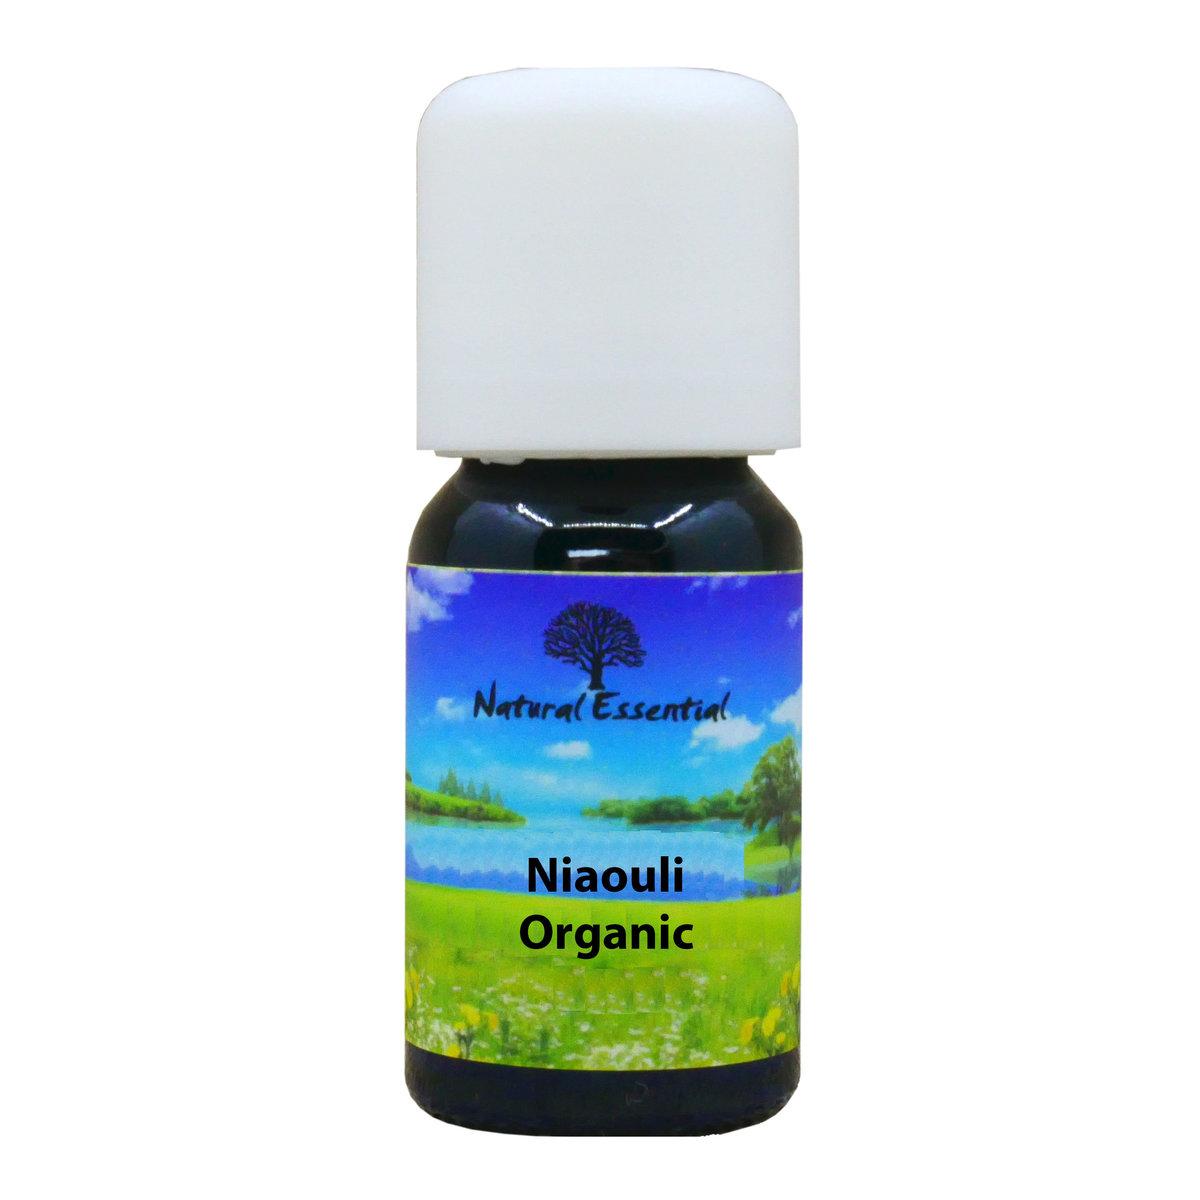 Niaouli Essential Oil, Organic (France)